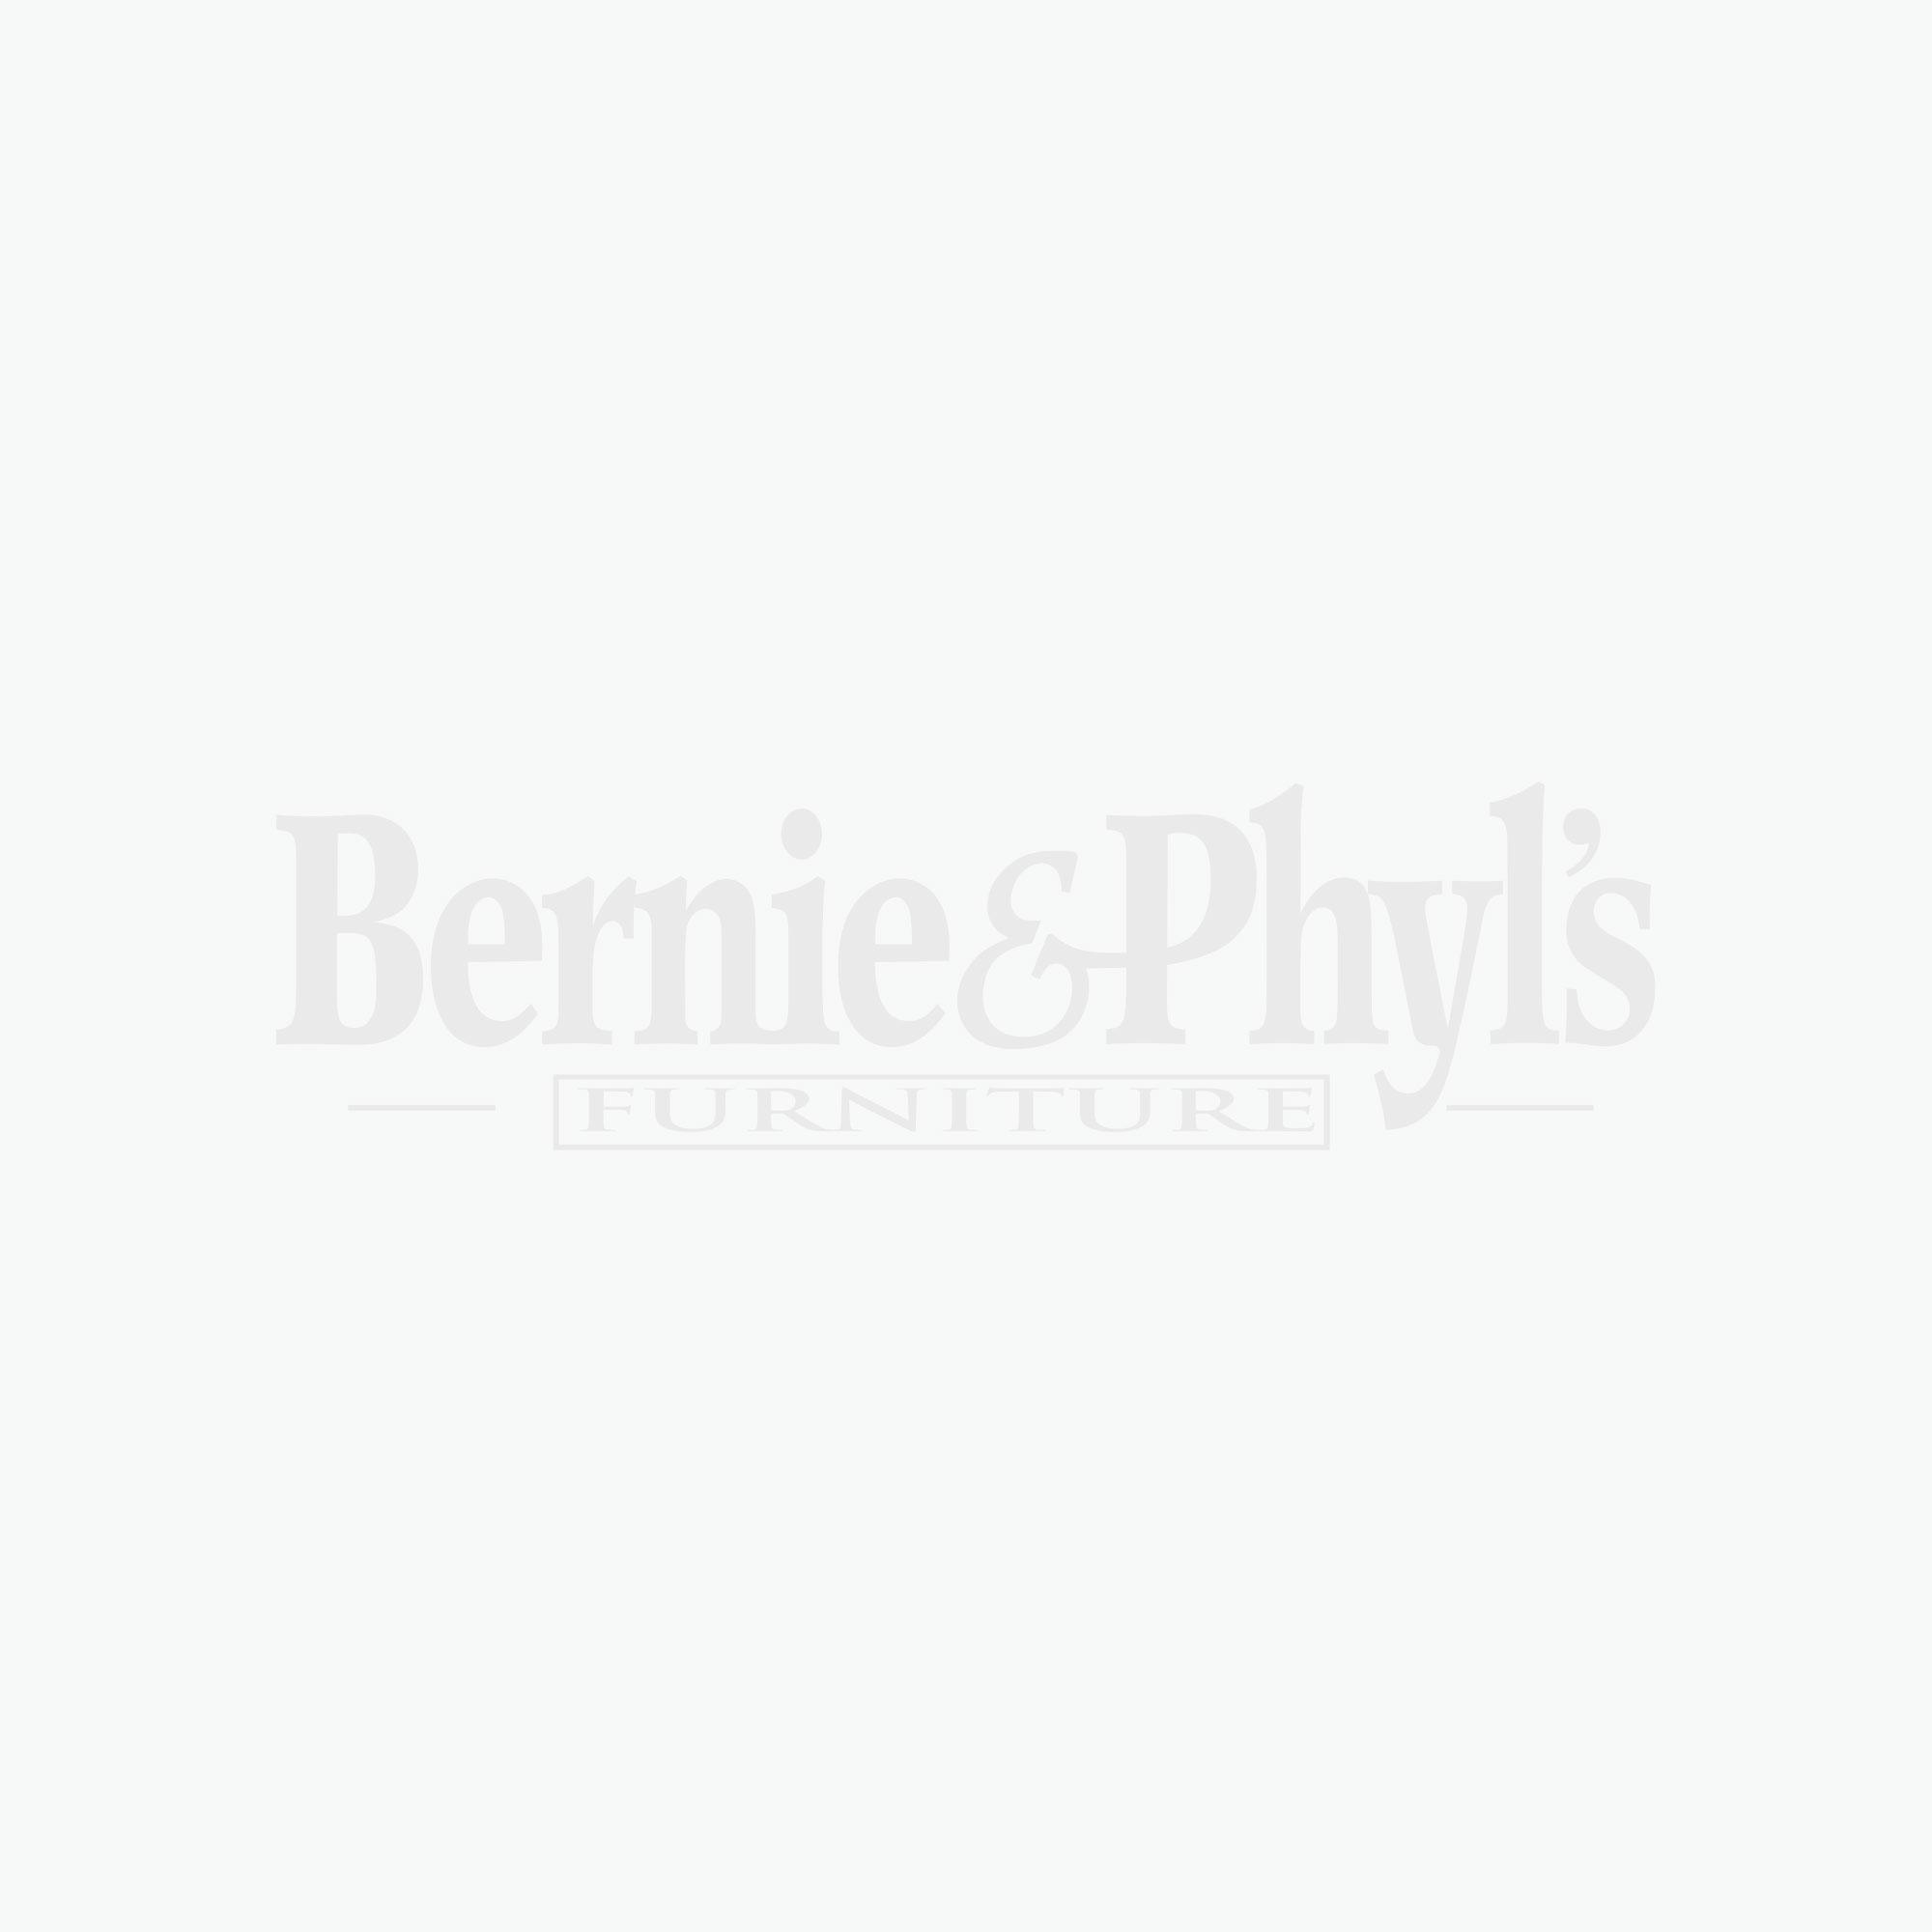 Bernie And Phyl S Furniture Nashua Nh